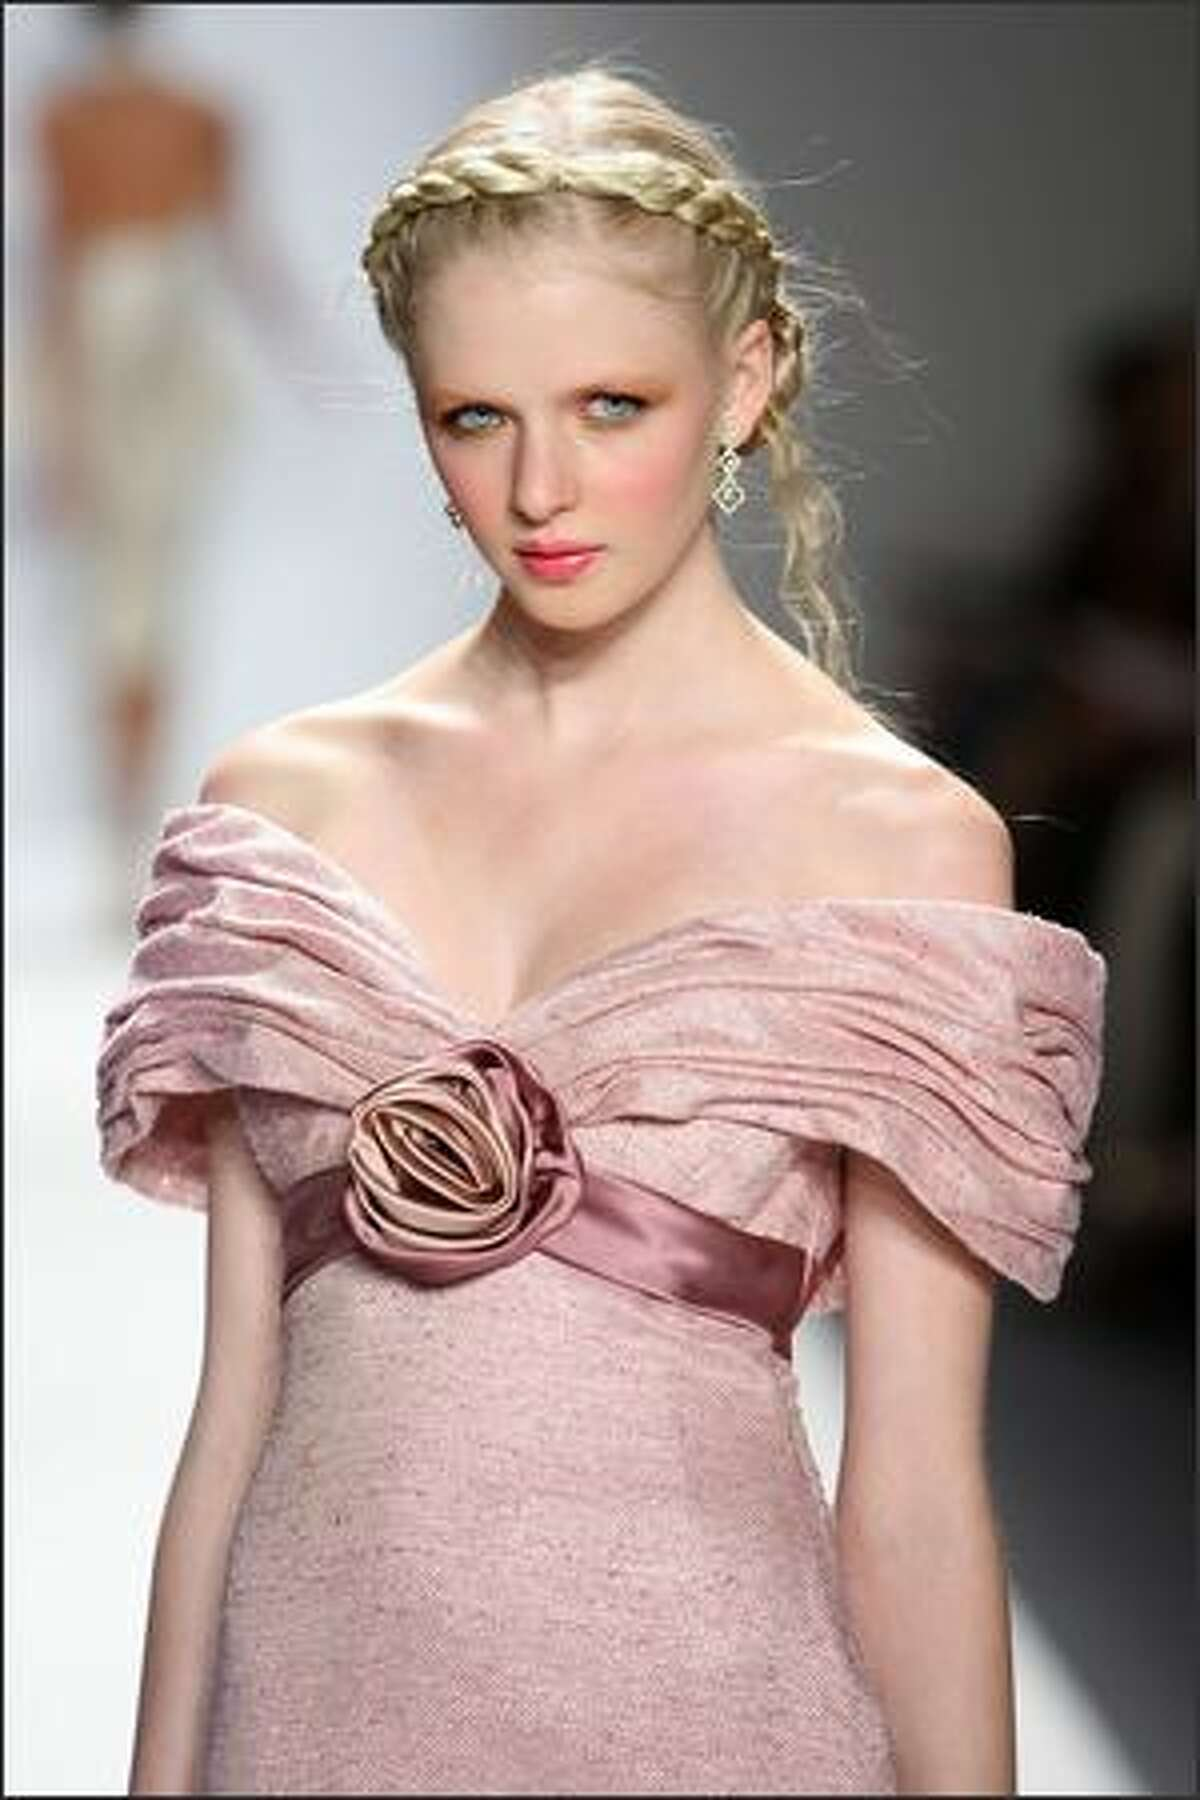 A model walks the runway at the Kati Stern/Venexiana show.